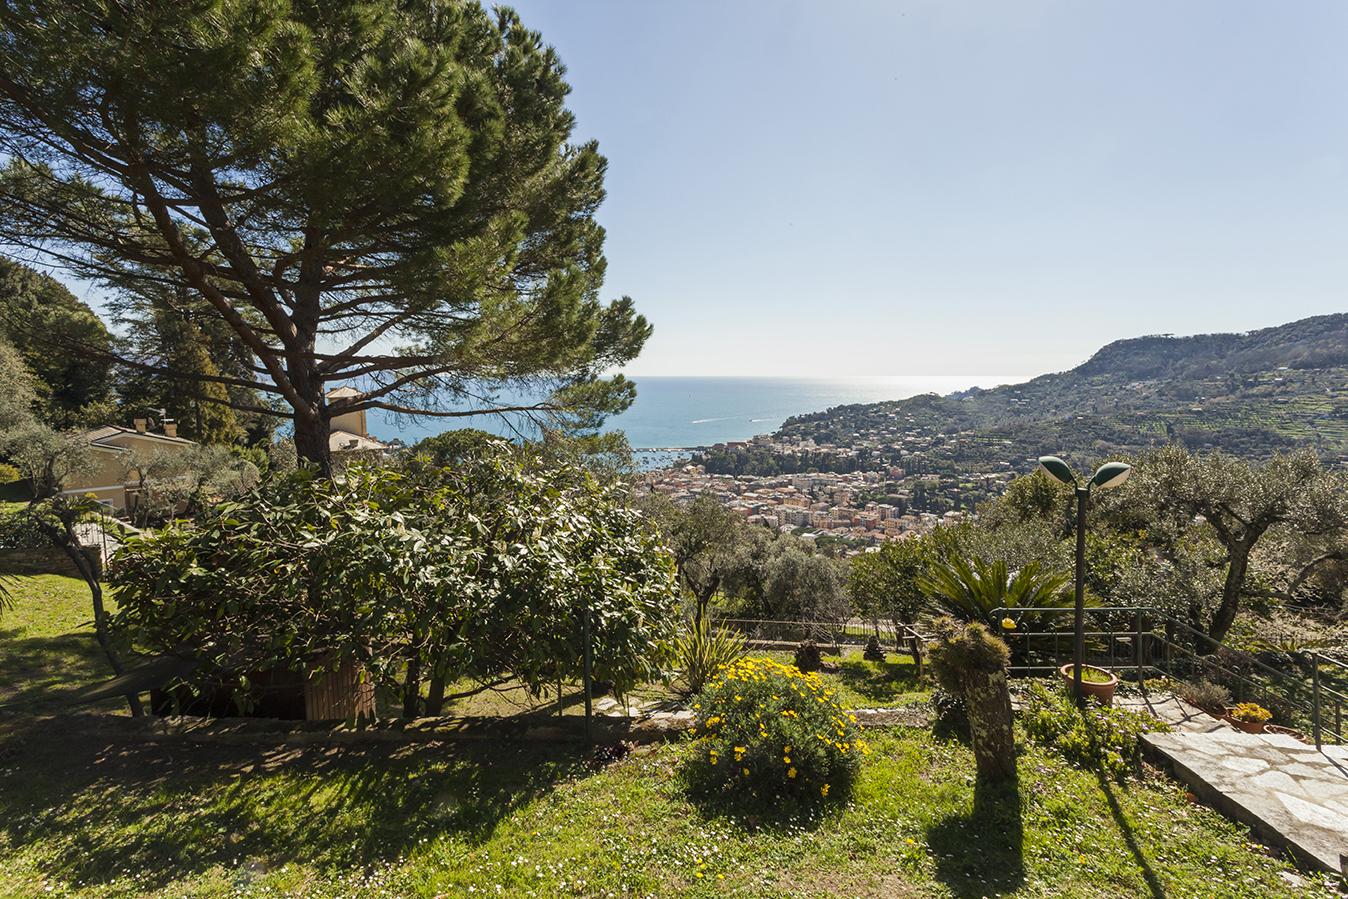 Single Family Home for Sale at Exsclusive villa with breathtaking view via Aurelia Santa Margherita Ligure, 16038 Italy